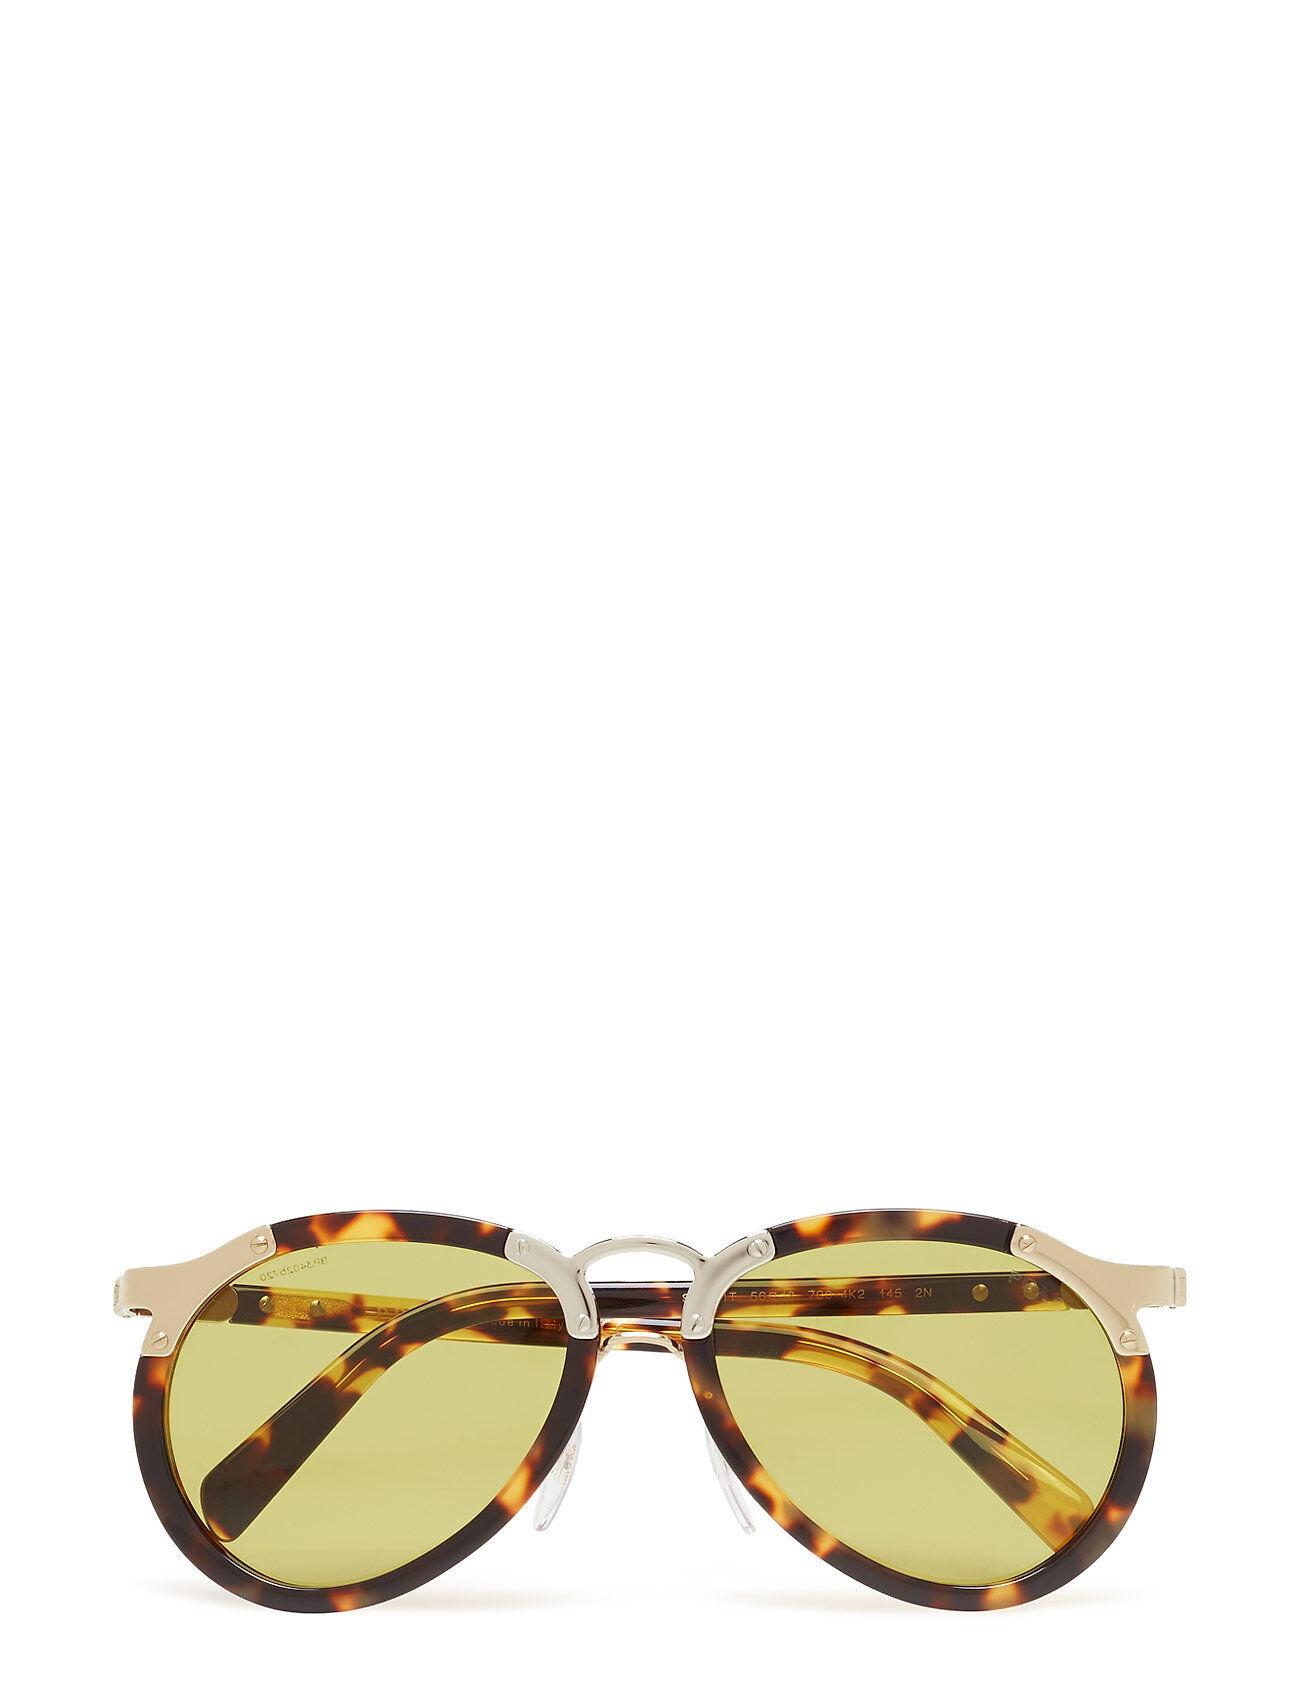 Image of Prada Sunglasses Catwalk Pilottilasit Aurinkolasit Kulta